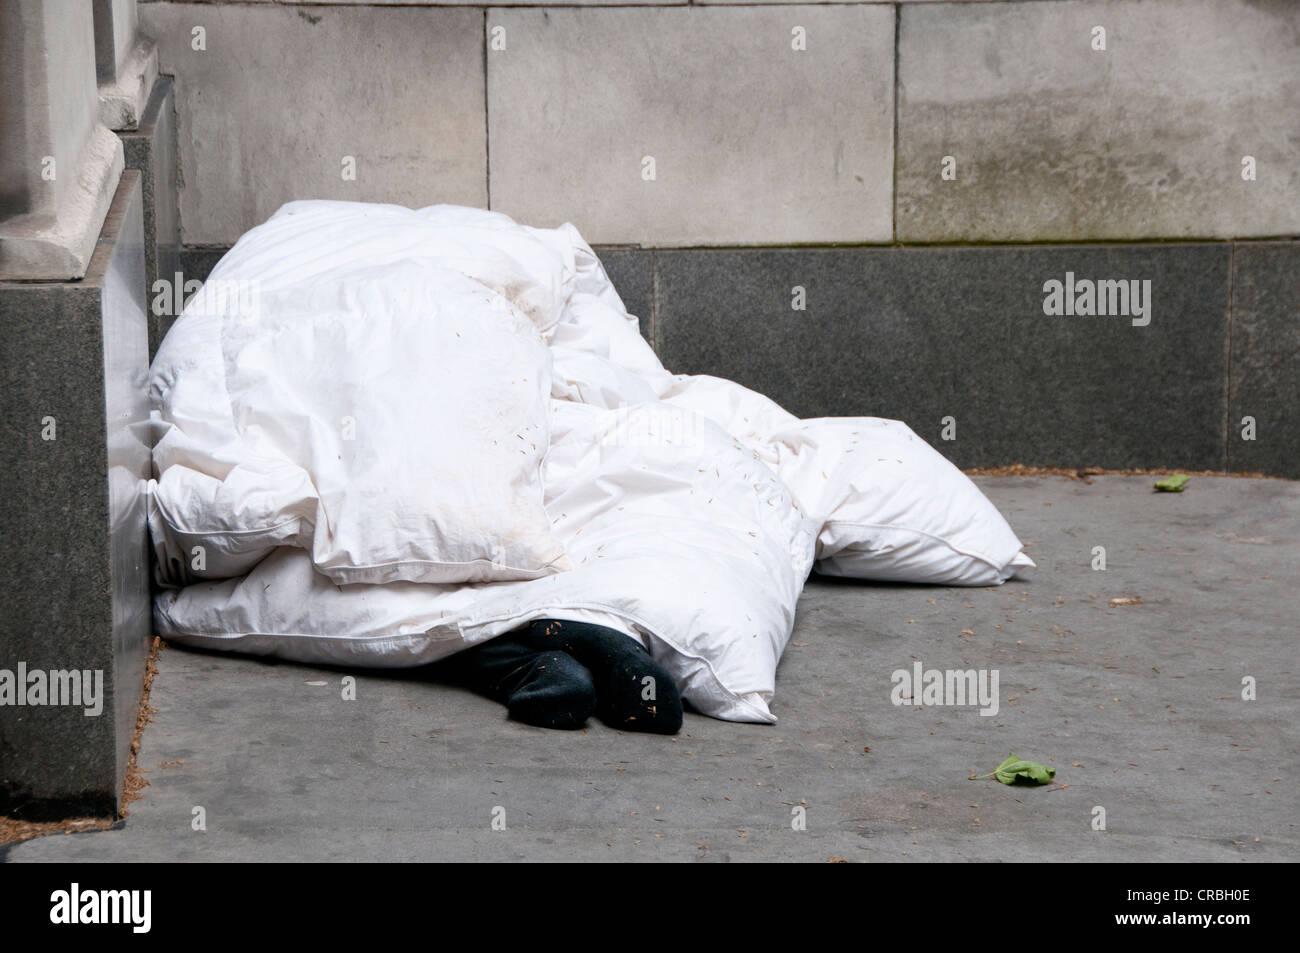 Central London. The Strand. Rough sleeper. Only socks visible under duvet - Stock Image